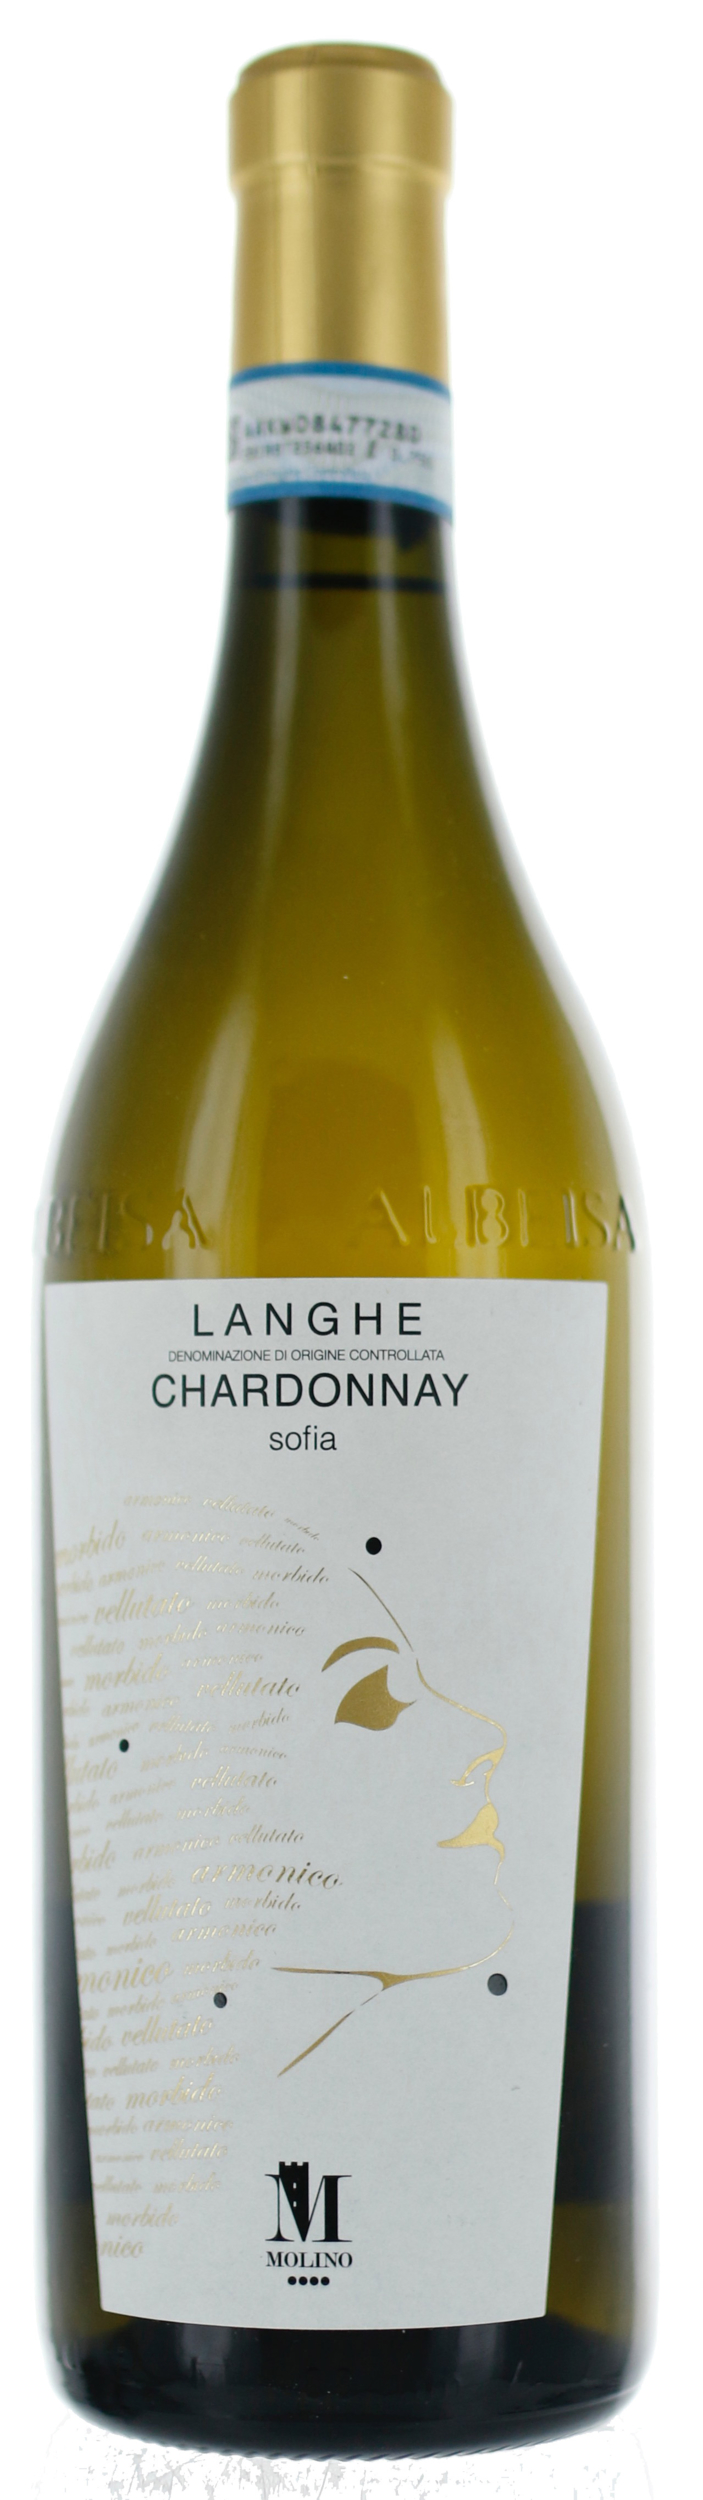 Langhe - Chardonnay Sofia - Agricola Molino - 2018